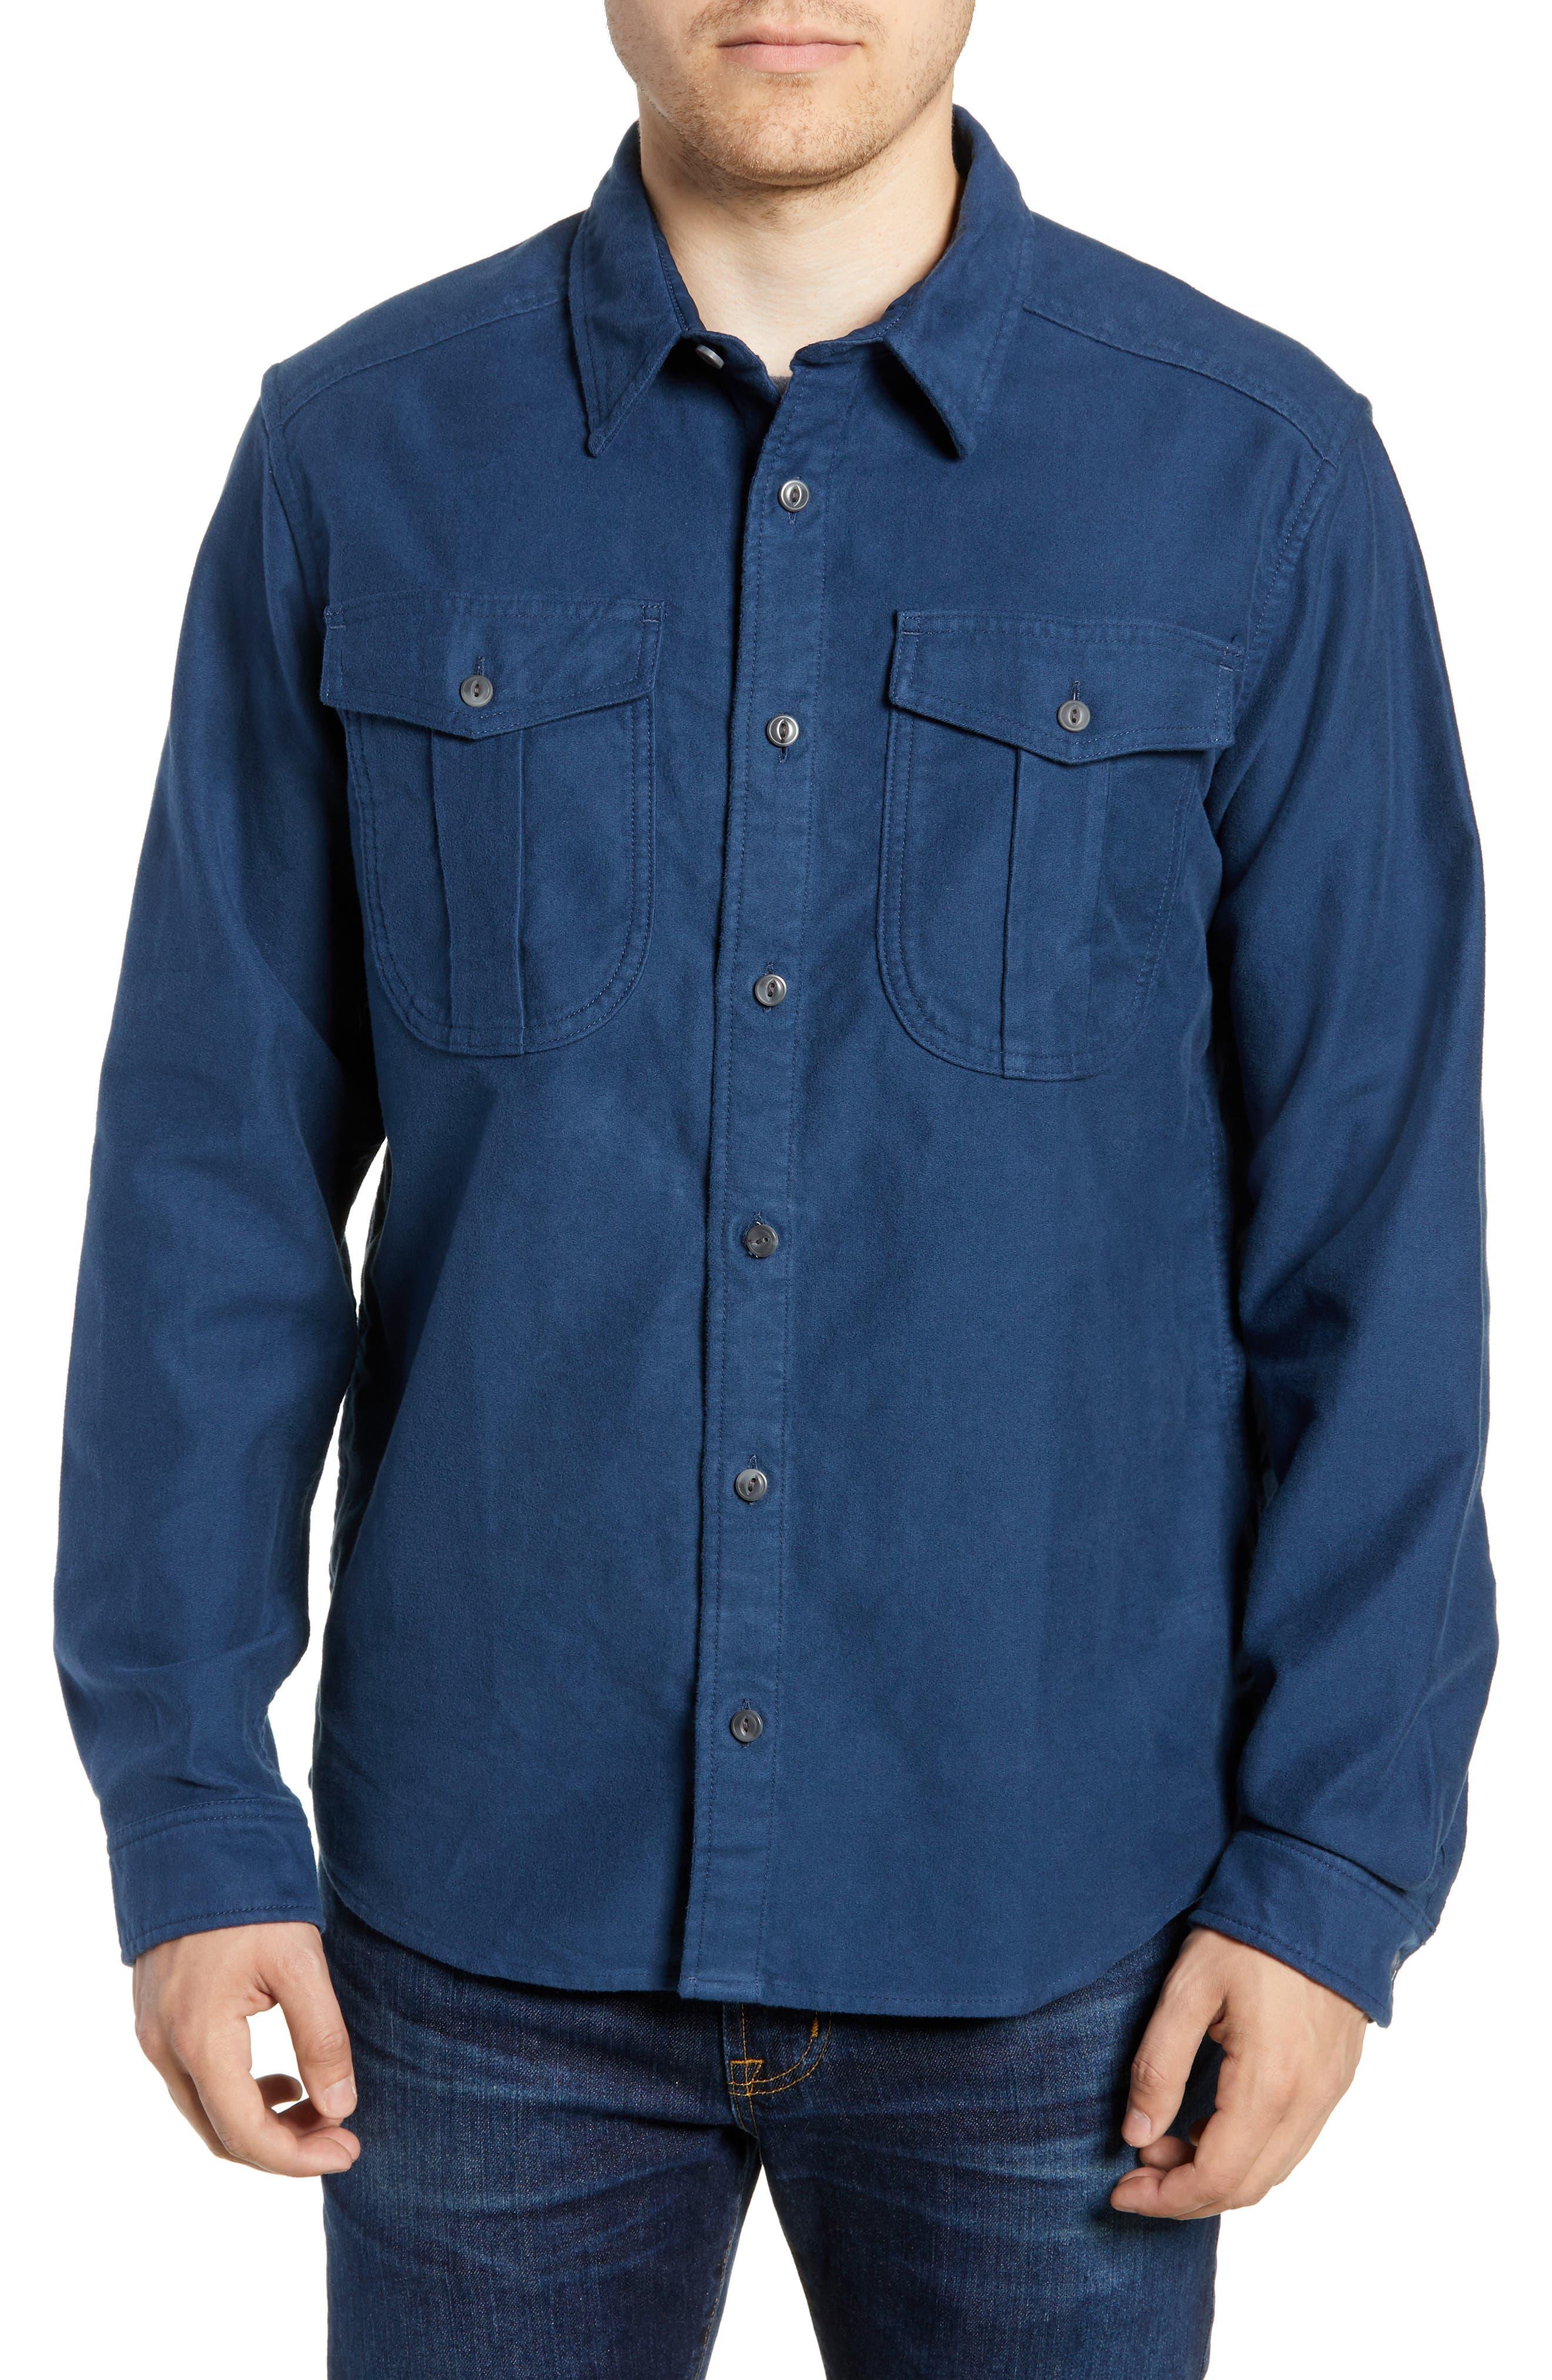 Topo Canyon Moleskin Shirt,                             Alternate thumbnail 2, color,                             400